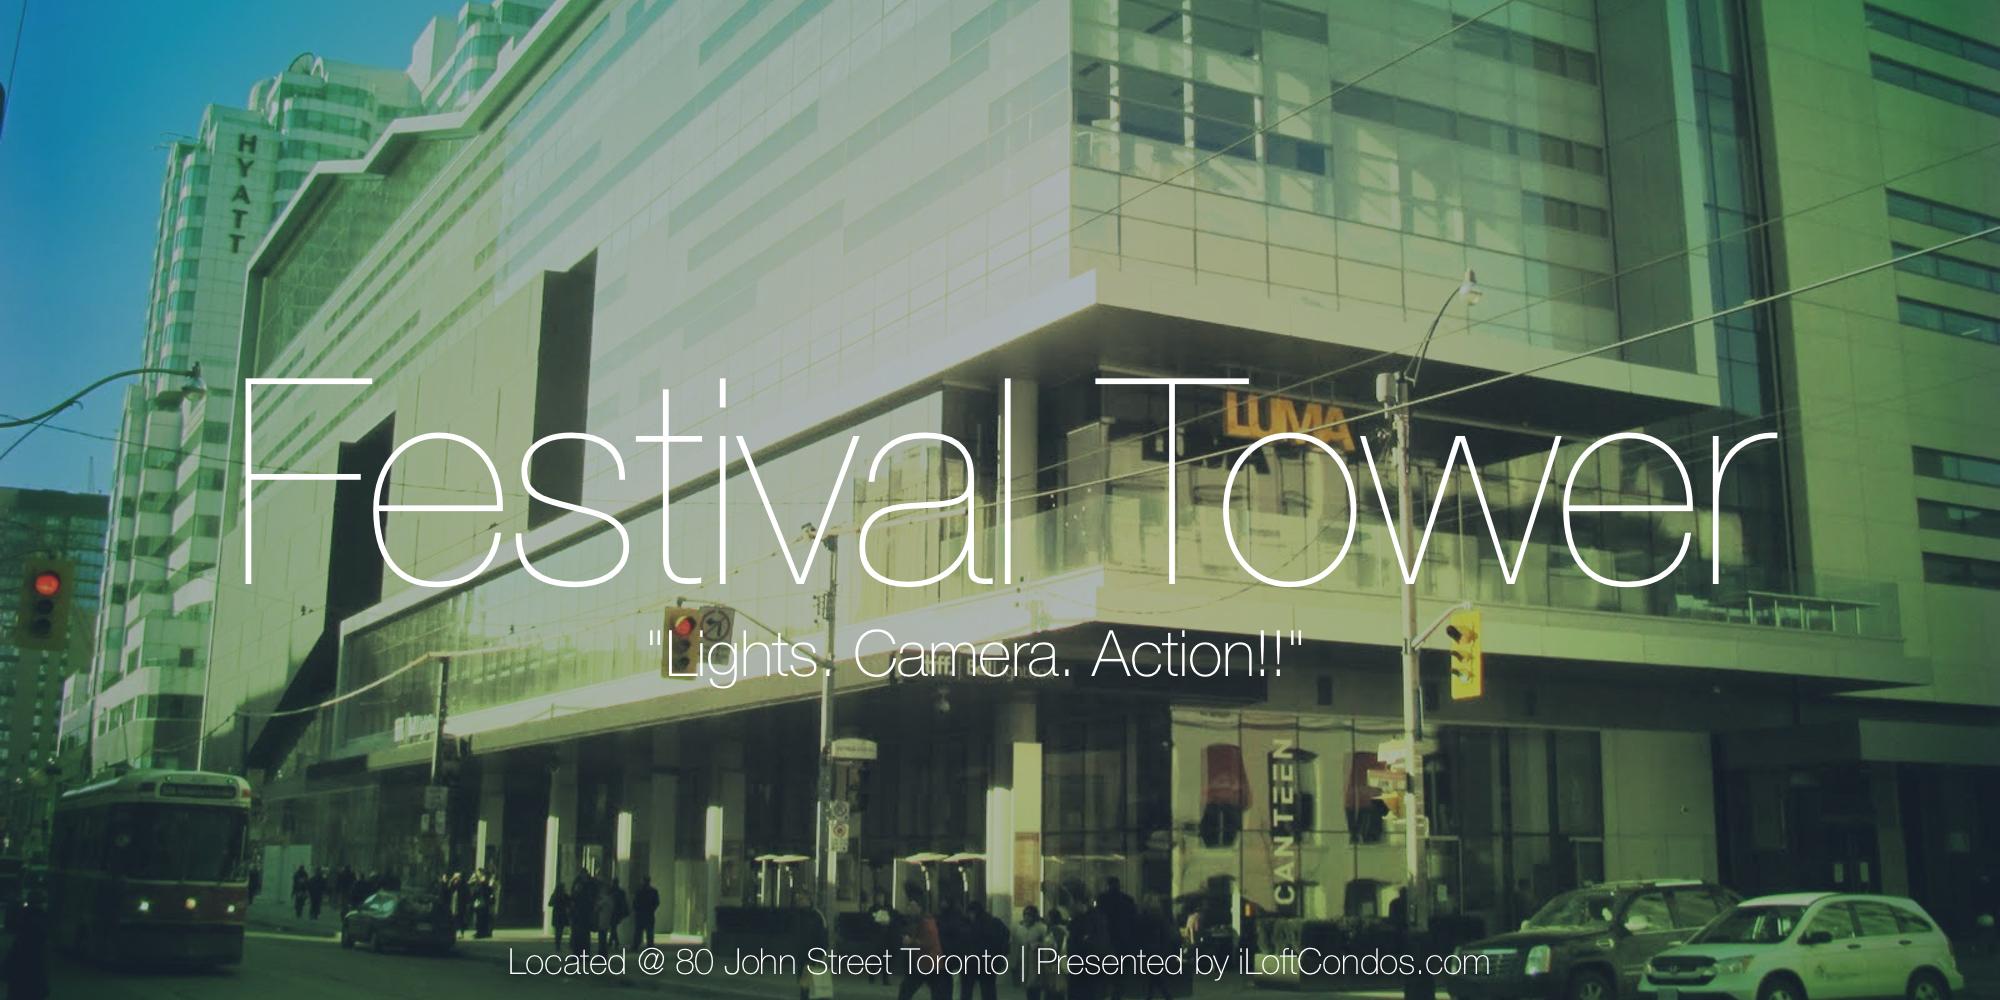 Fesitval Tower - 80 John Street Toronto